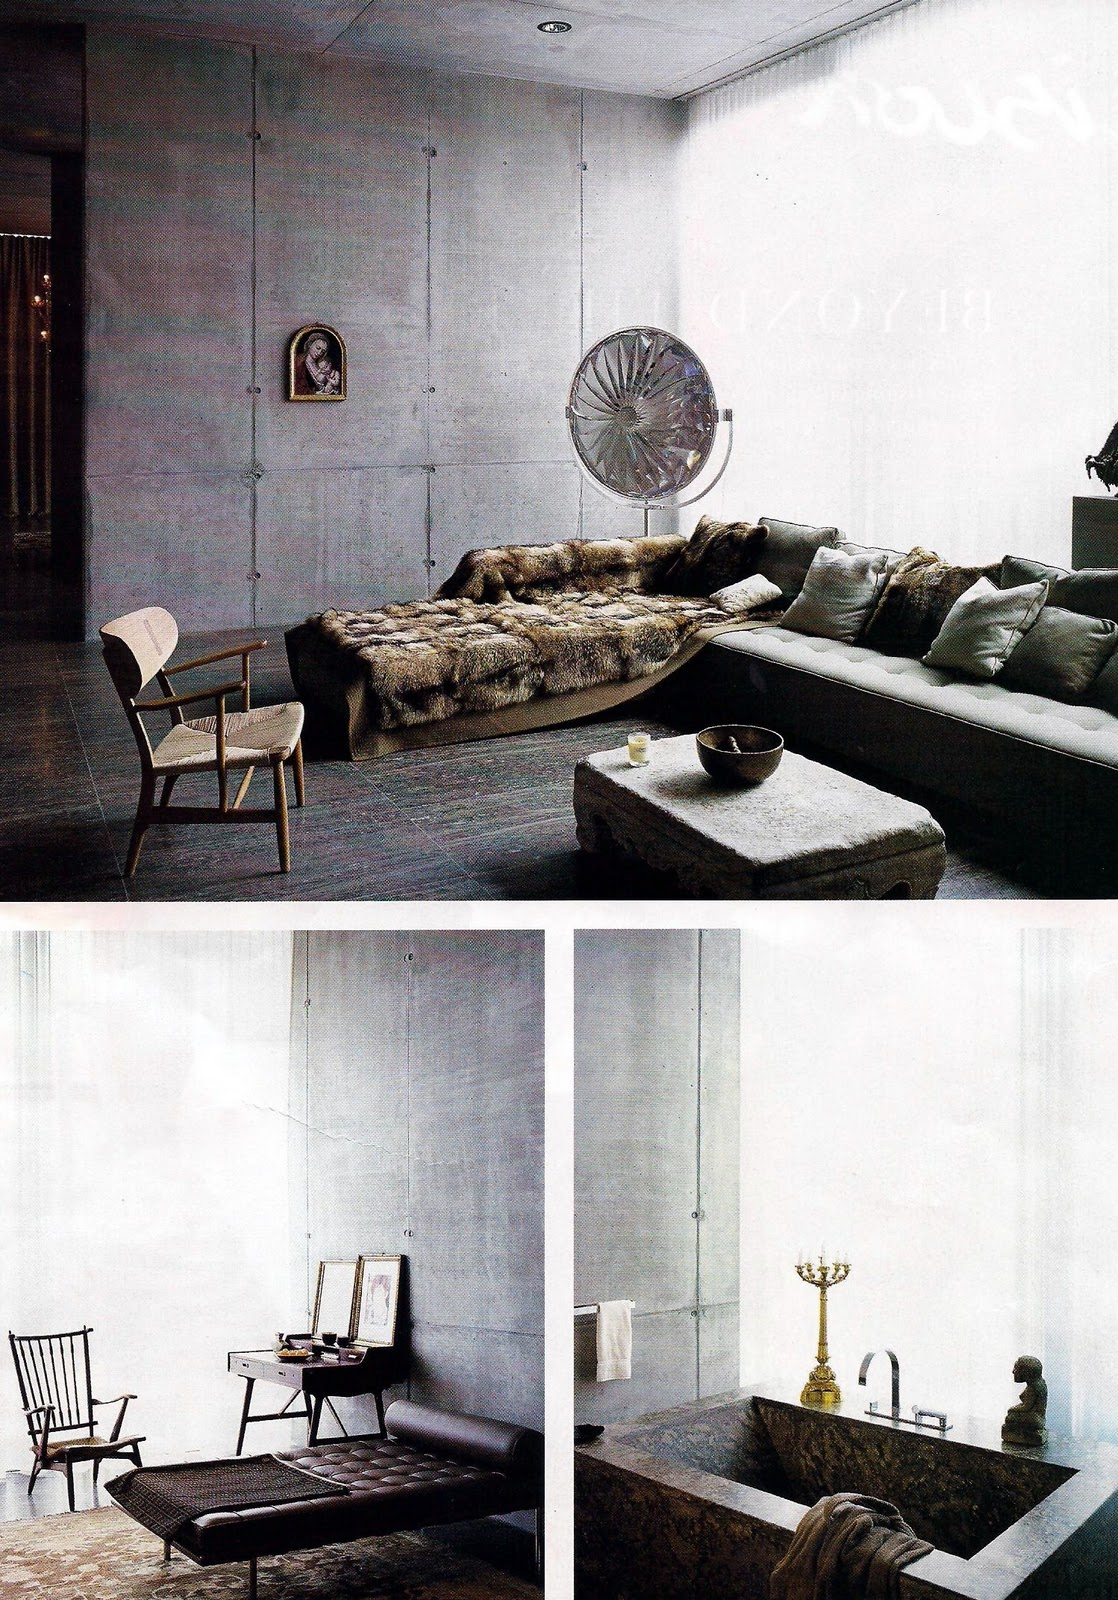 ren e finberg 39 tells all 39 in her blog of her adventures in design berlin concrete walls. Black Bedroom Furniture Sets. Home Design Ideas